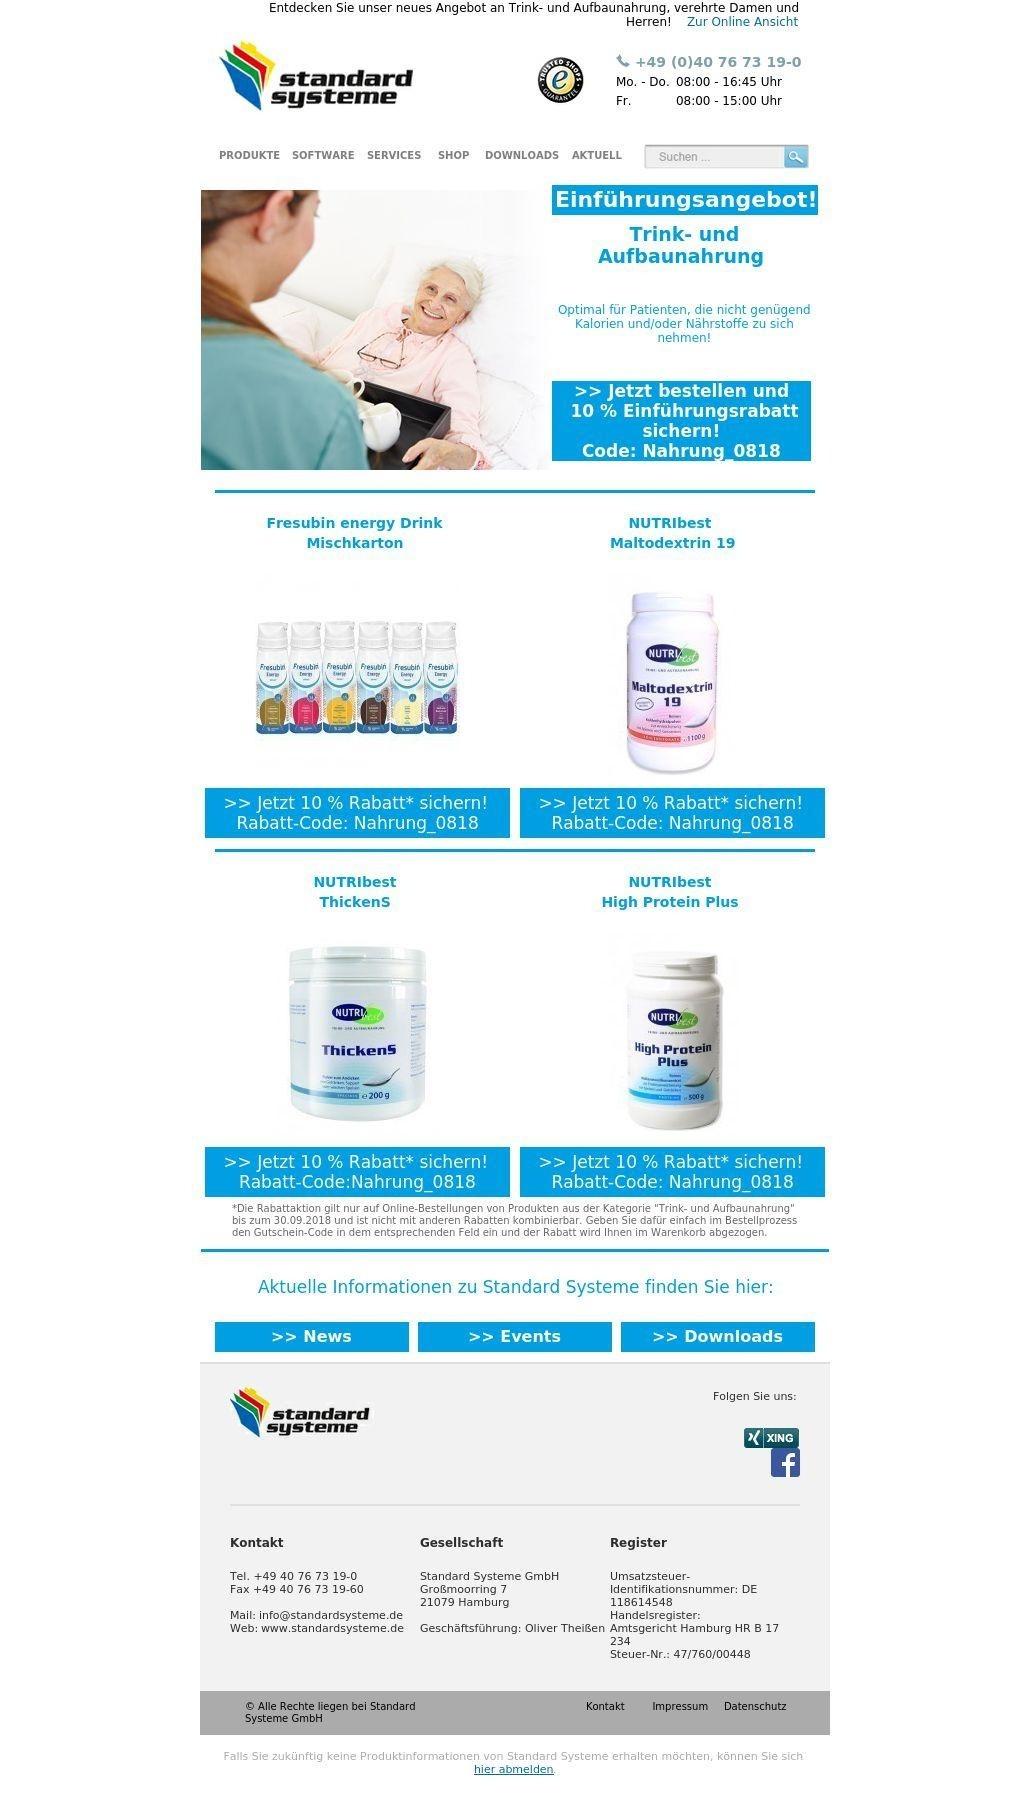 Mobile Pflege - Produkt-News 08/18